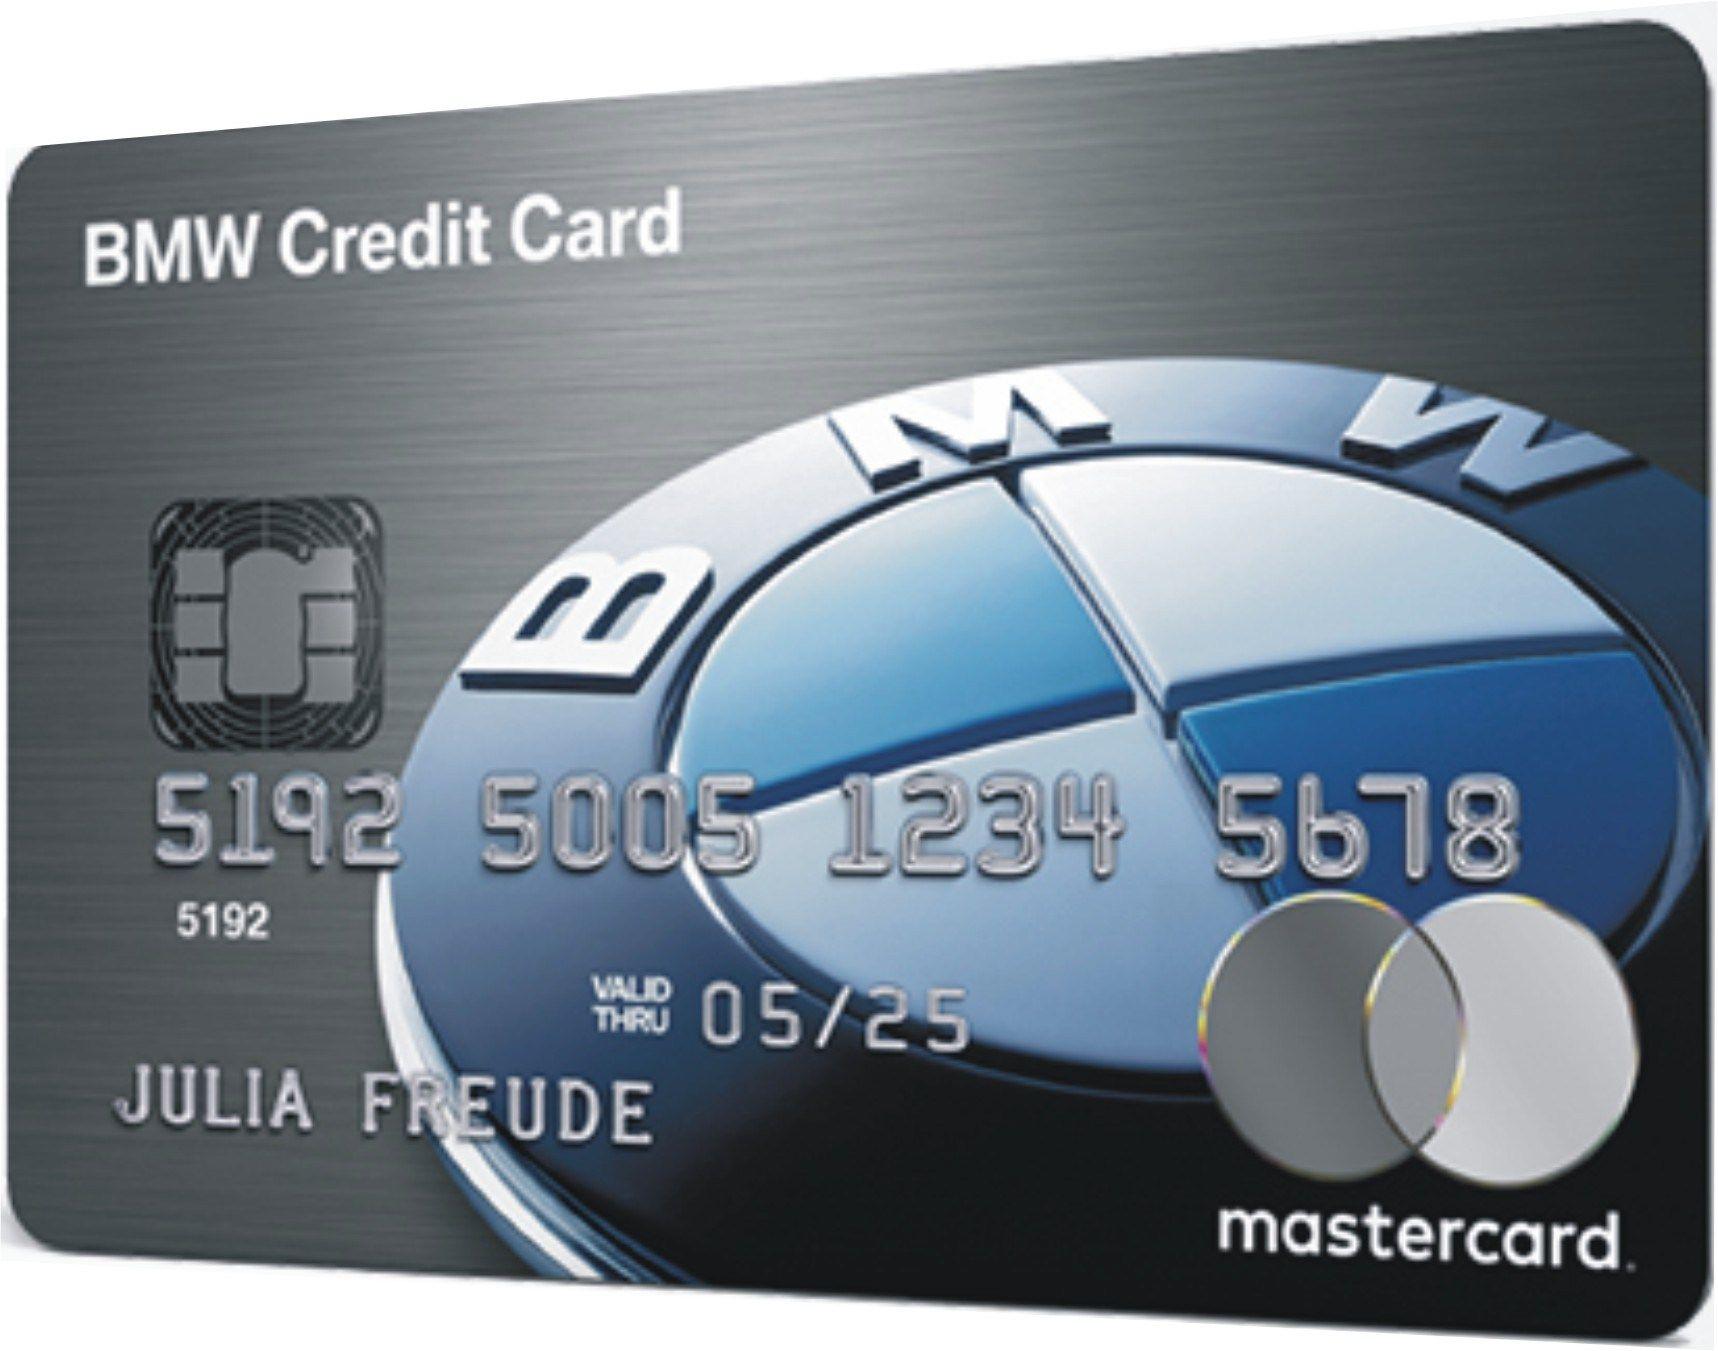 Bmw Platinum Visa Credit Card Review With Images Credit Card